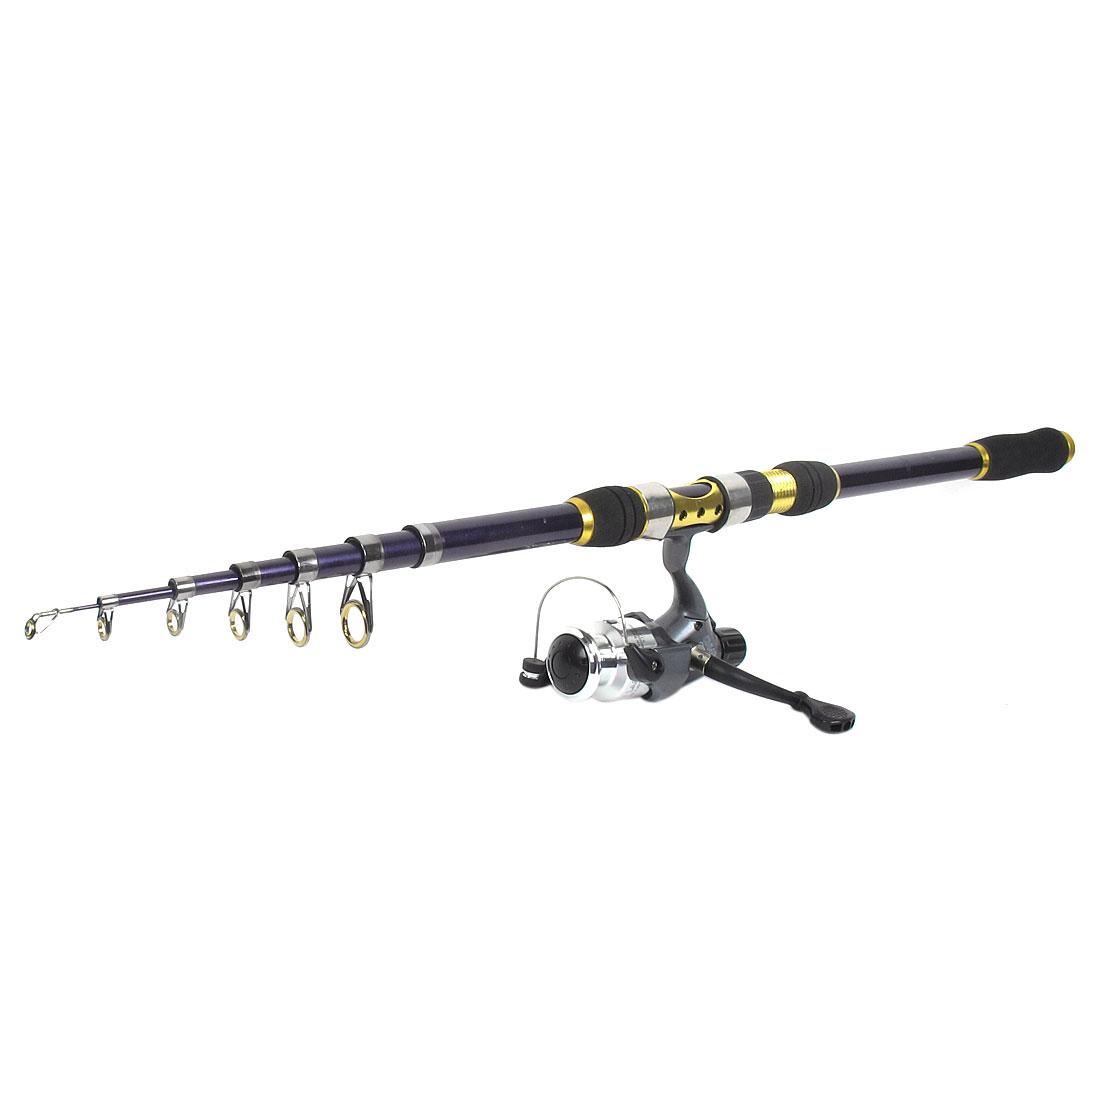 3.6M Telescopic Carbon Fiber Retractable Fishing Rod + HL 40 Fishing Reel